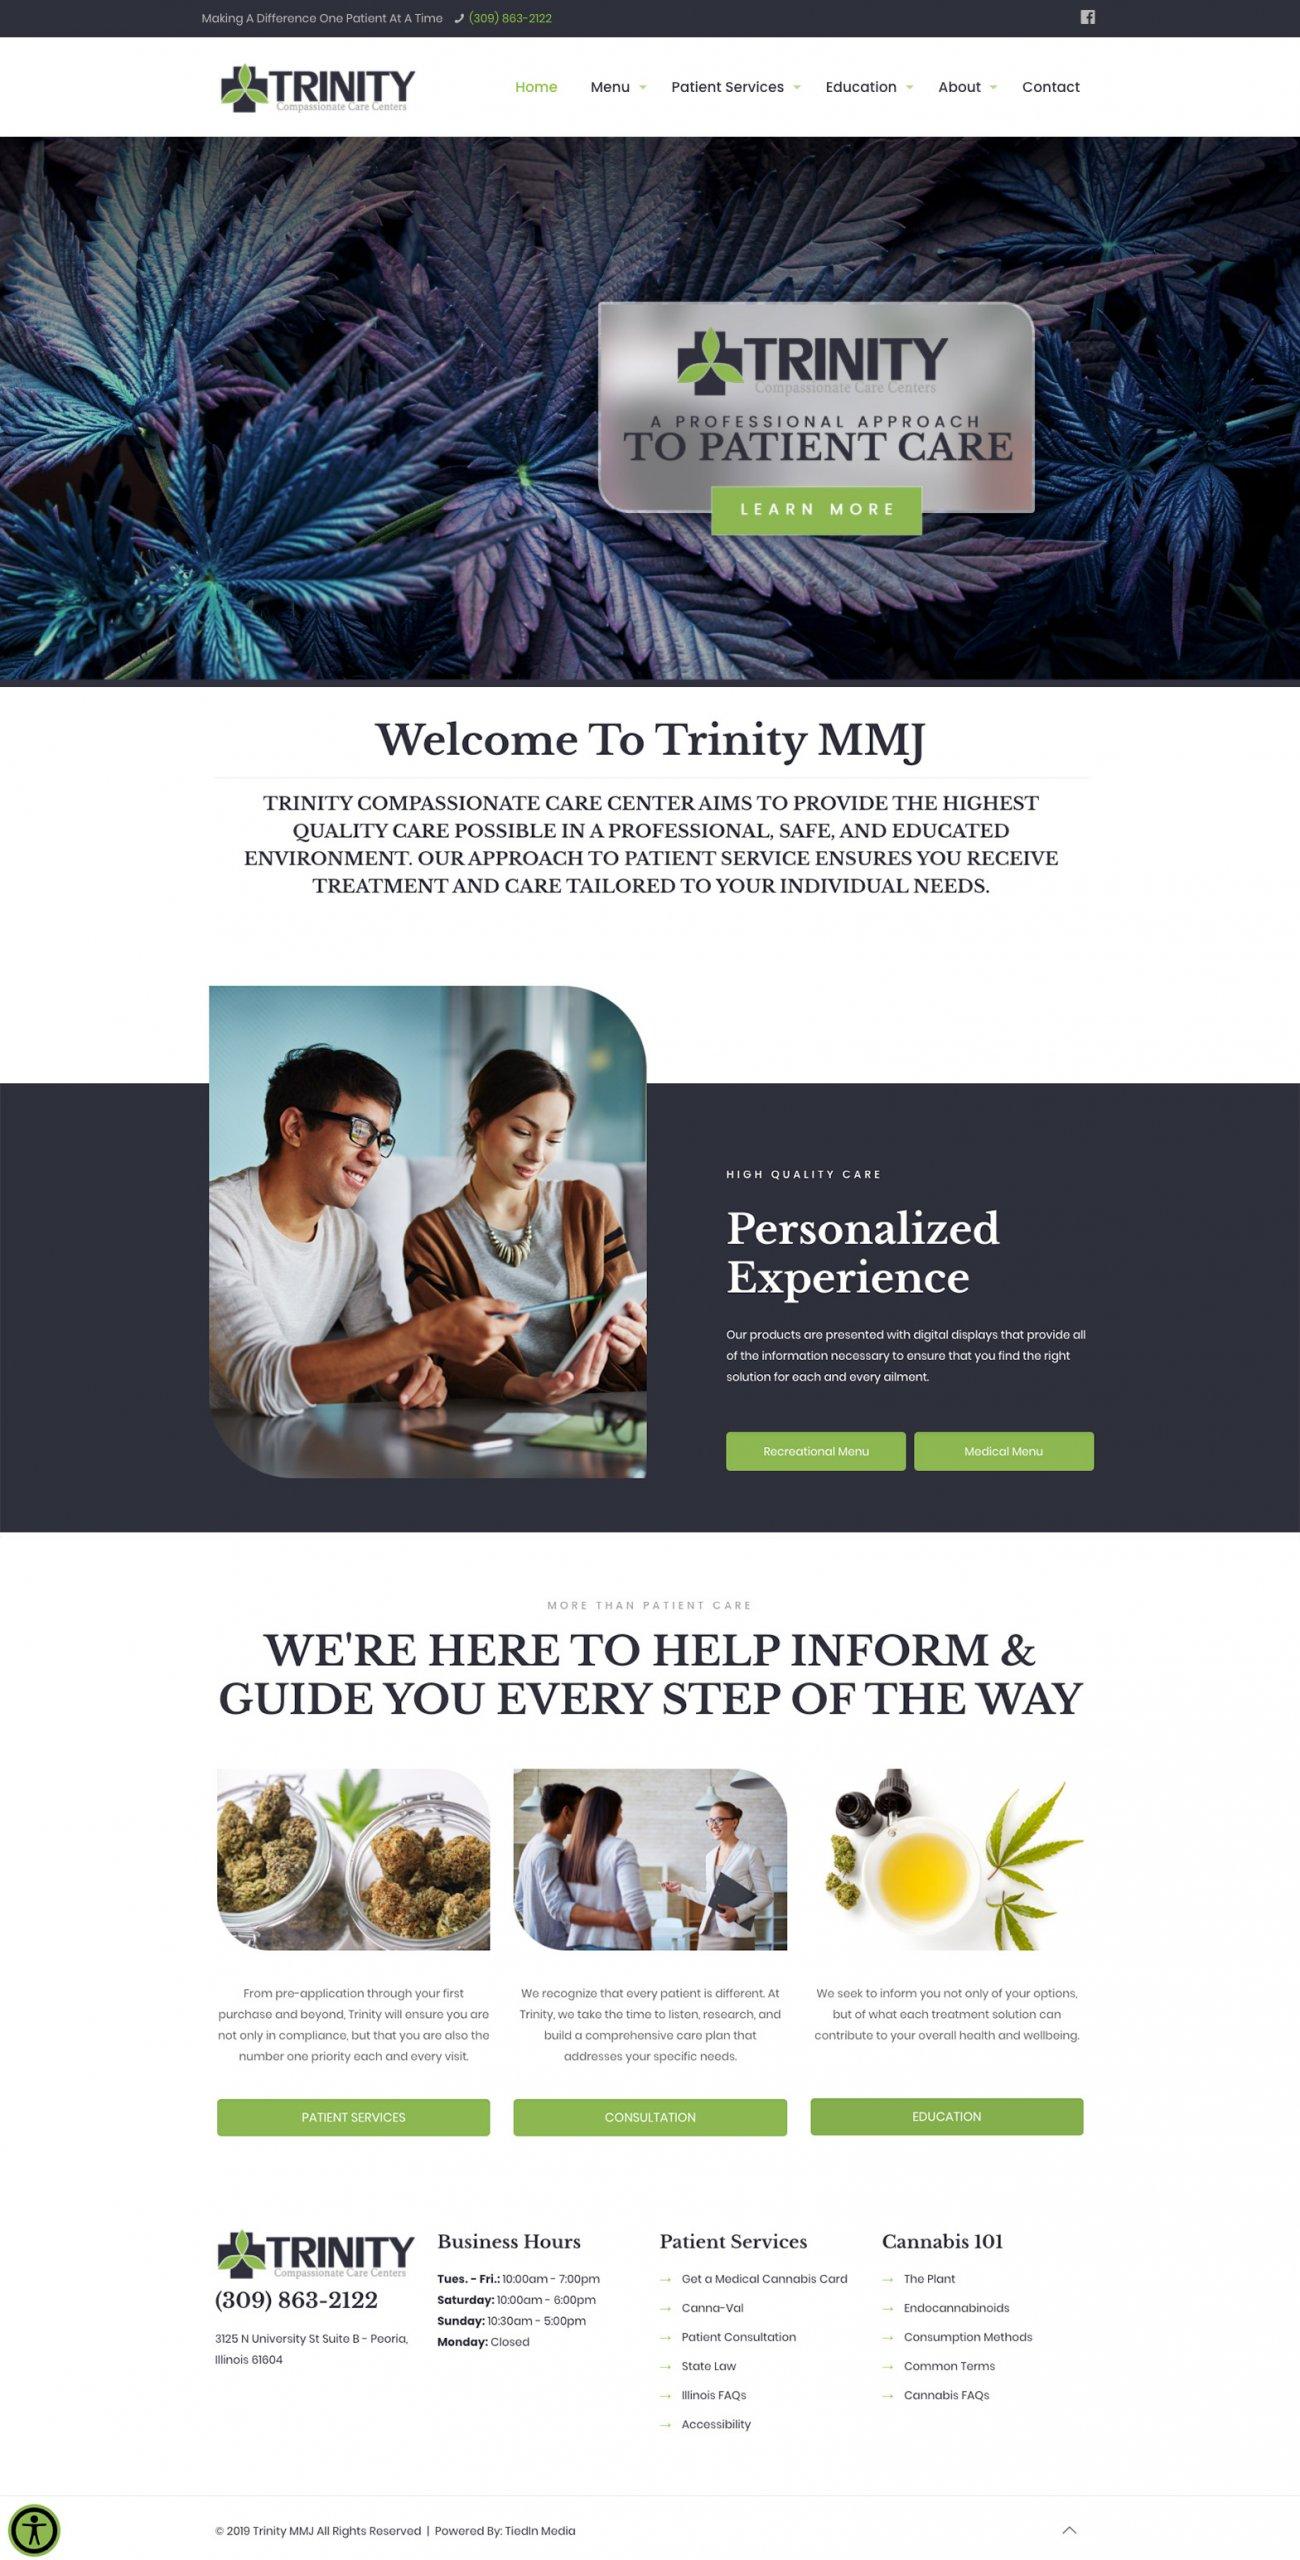 Trinity website homepage design